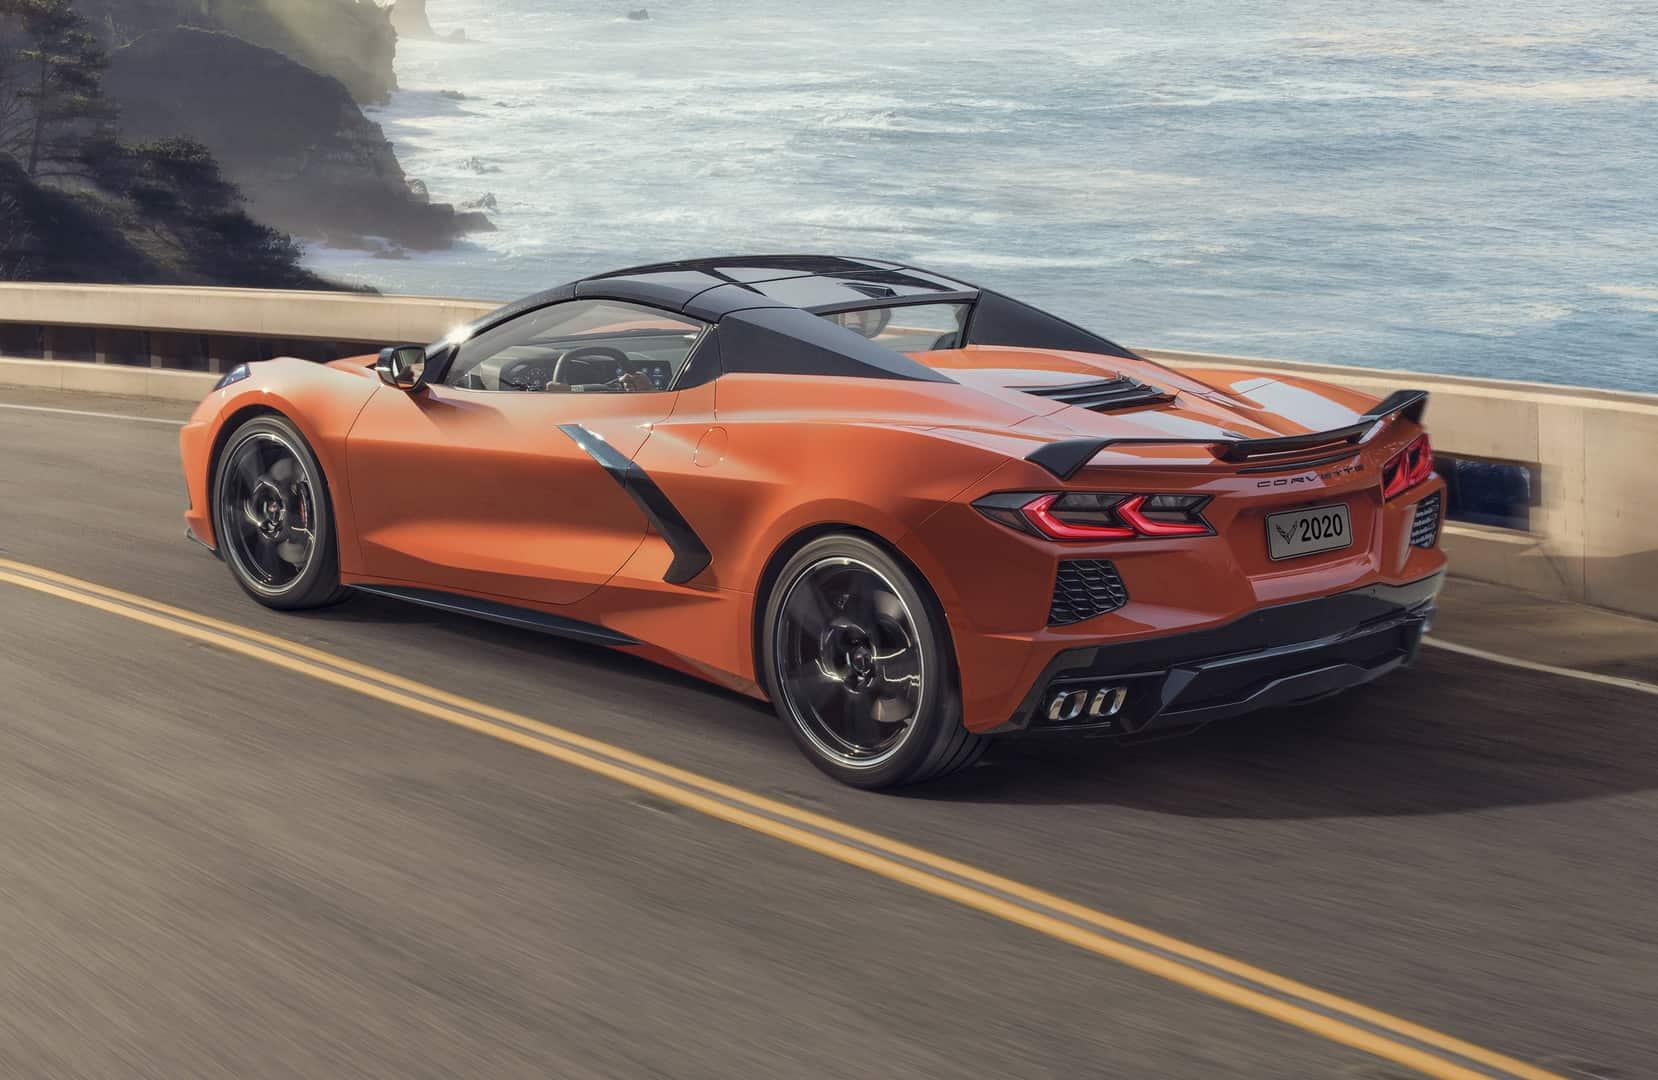 2020 Chevrolet Corvette Stingray Convertible 4